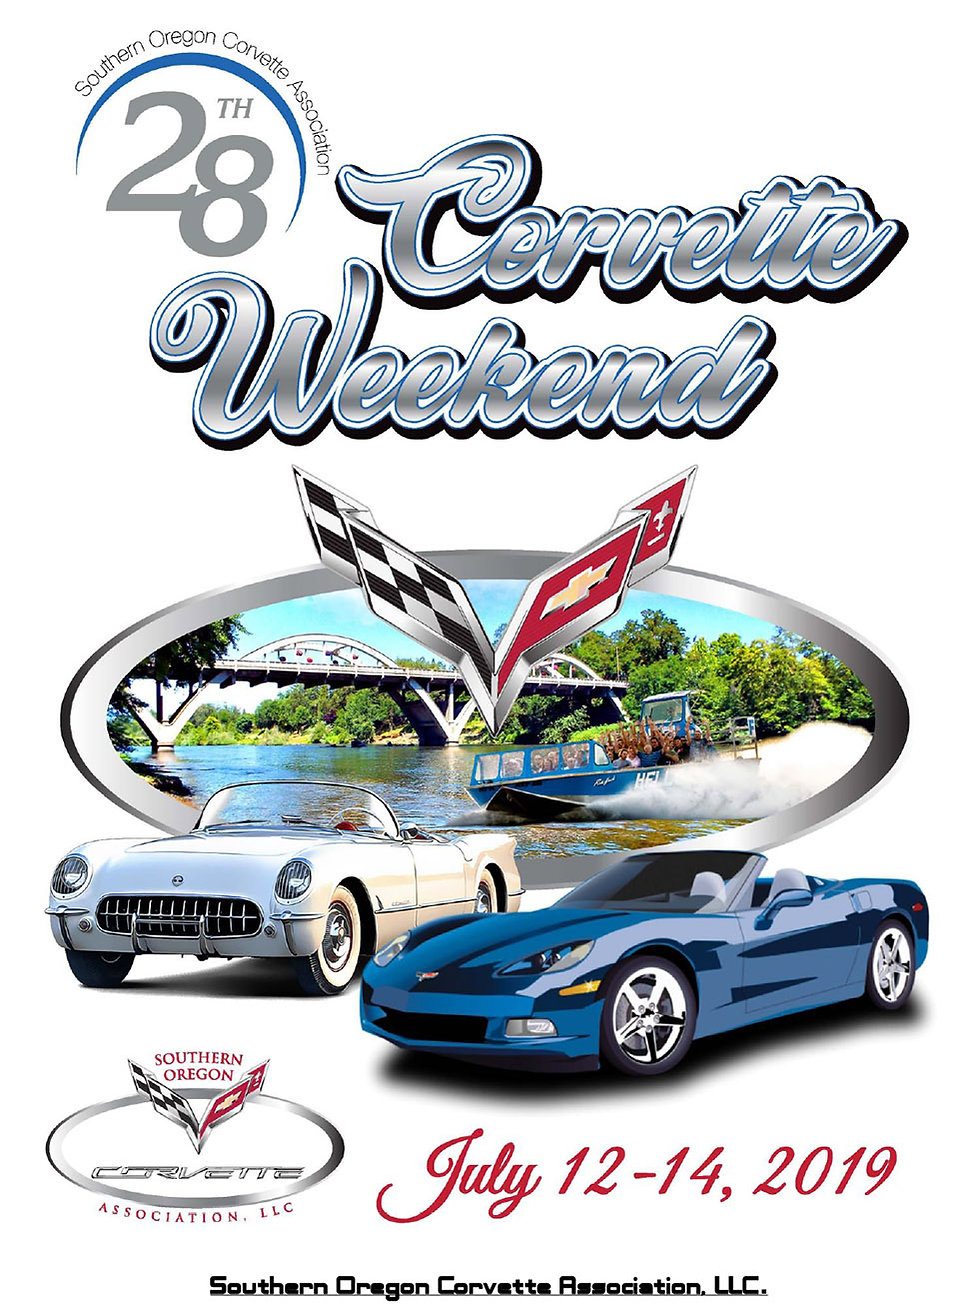 Southern Oregon Corvette Association 28th Corvette Weekend 2019